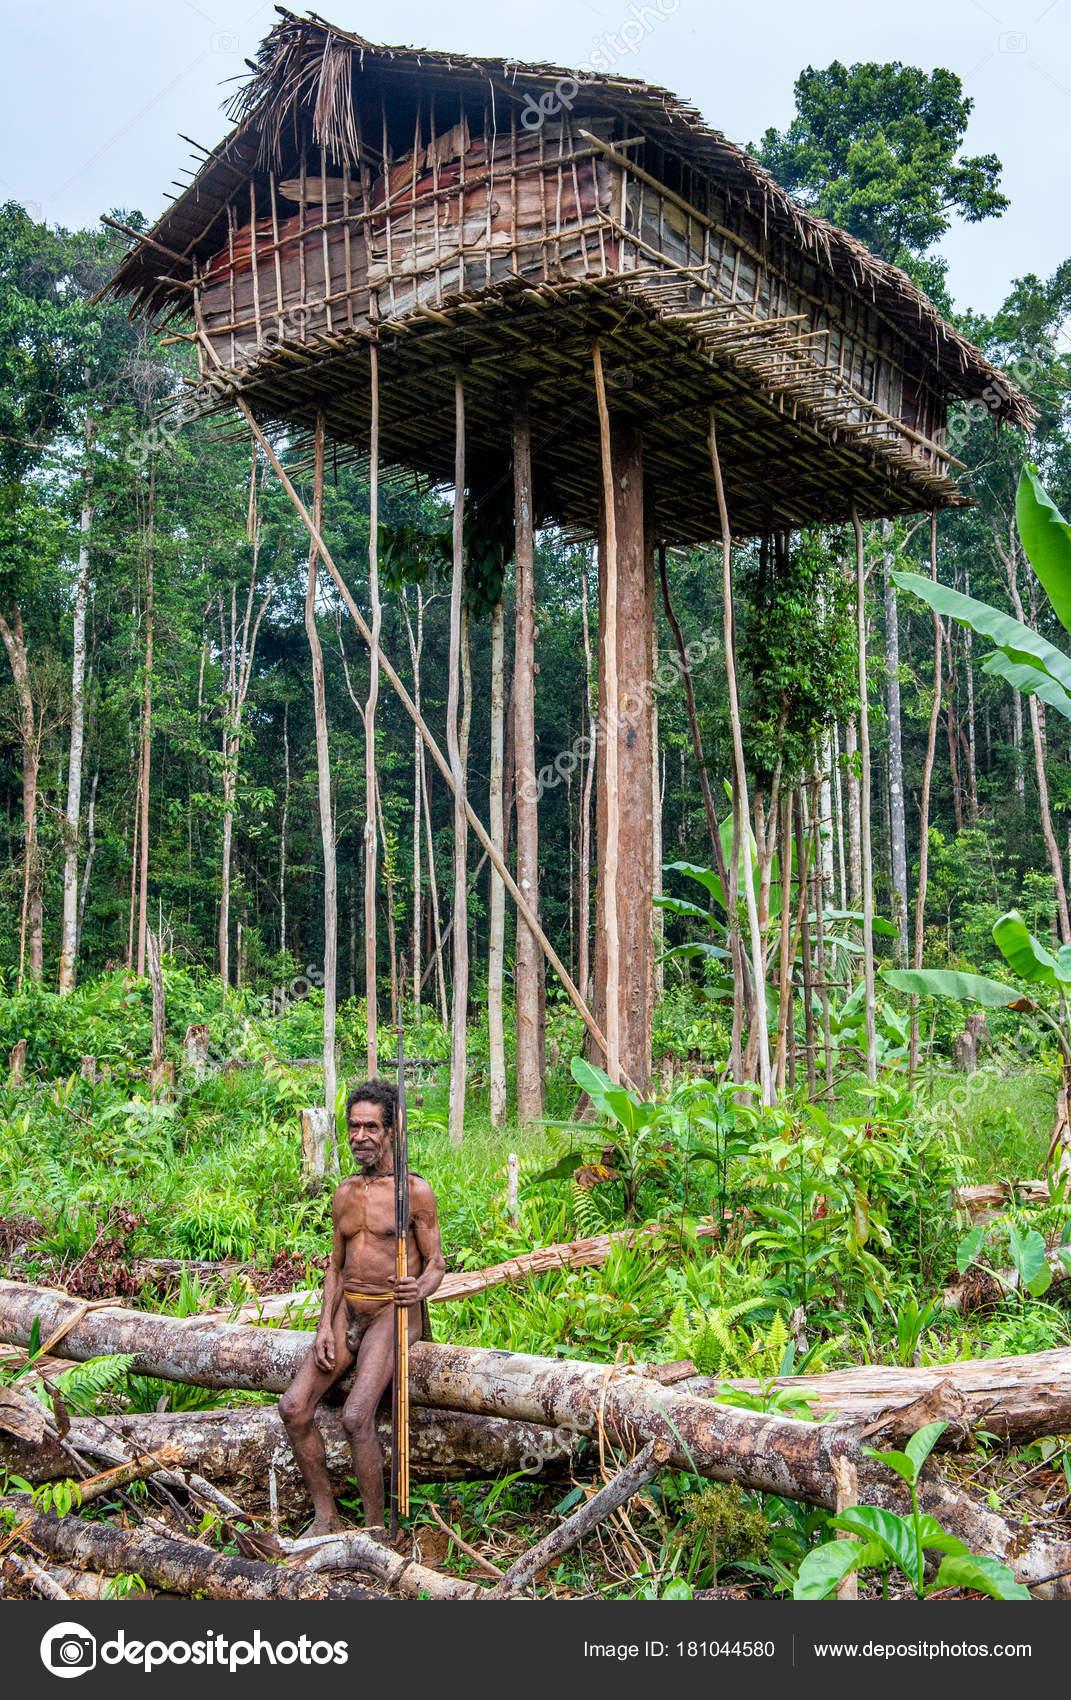 Pics: guinea | Indonesia New Guinea Irian Jaya Onni Village